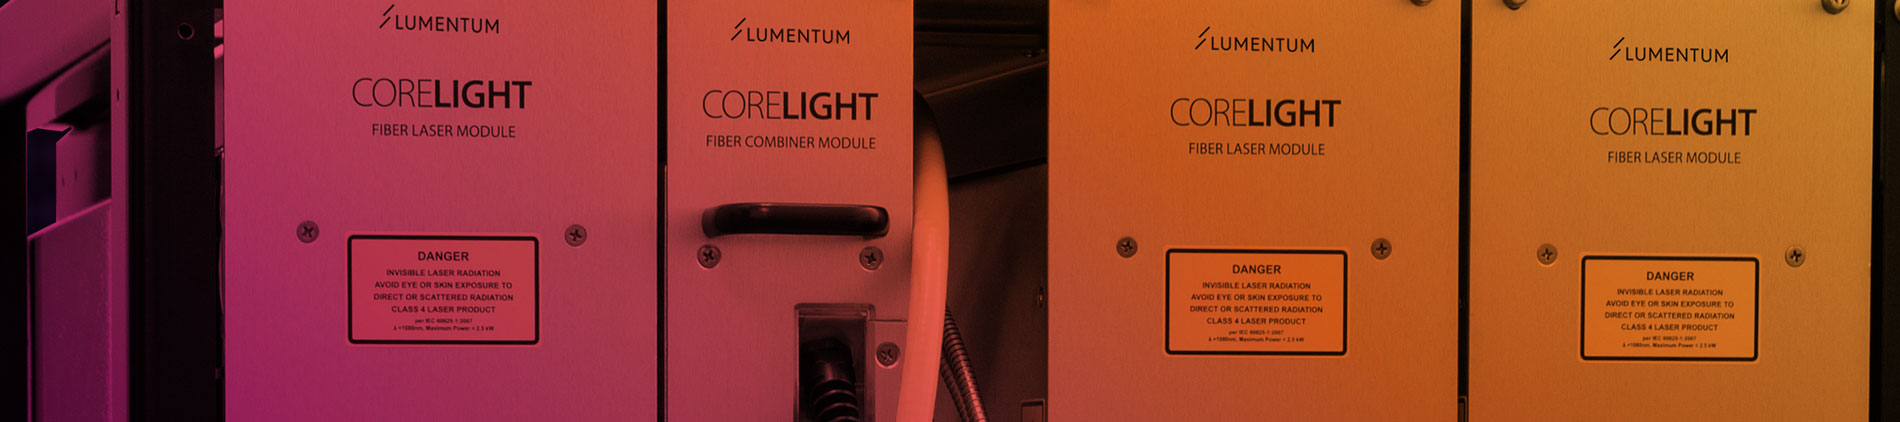 Fiber Laser Modules